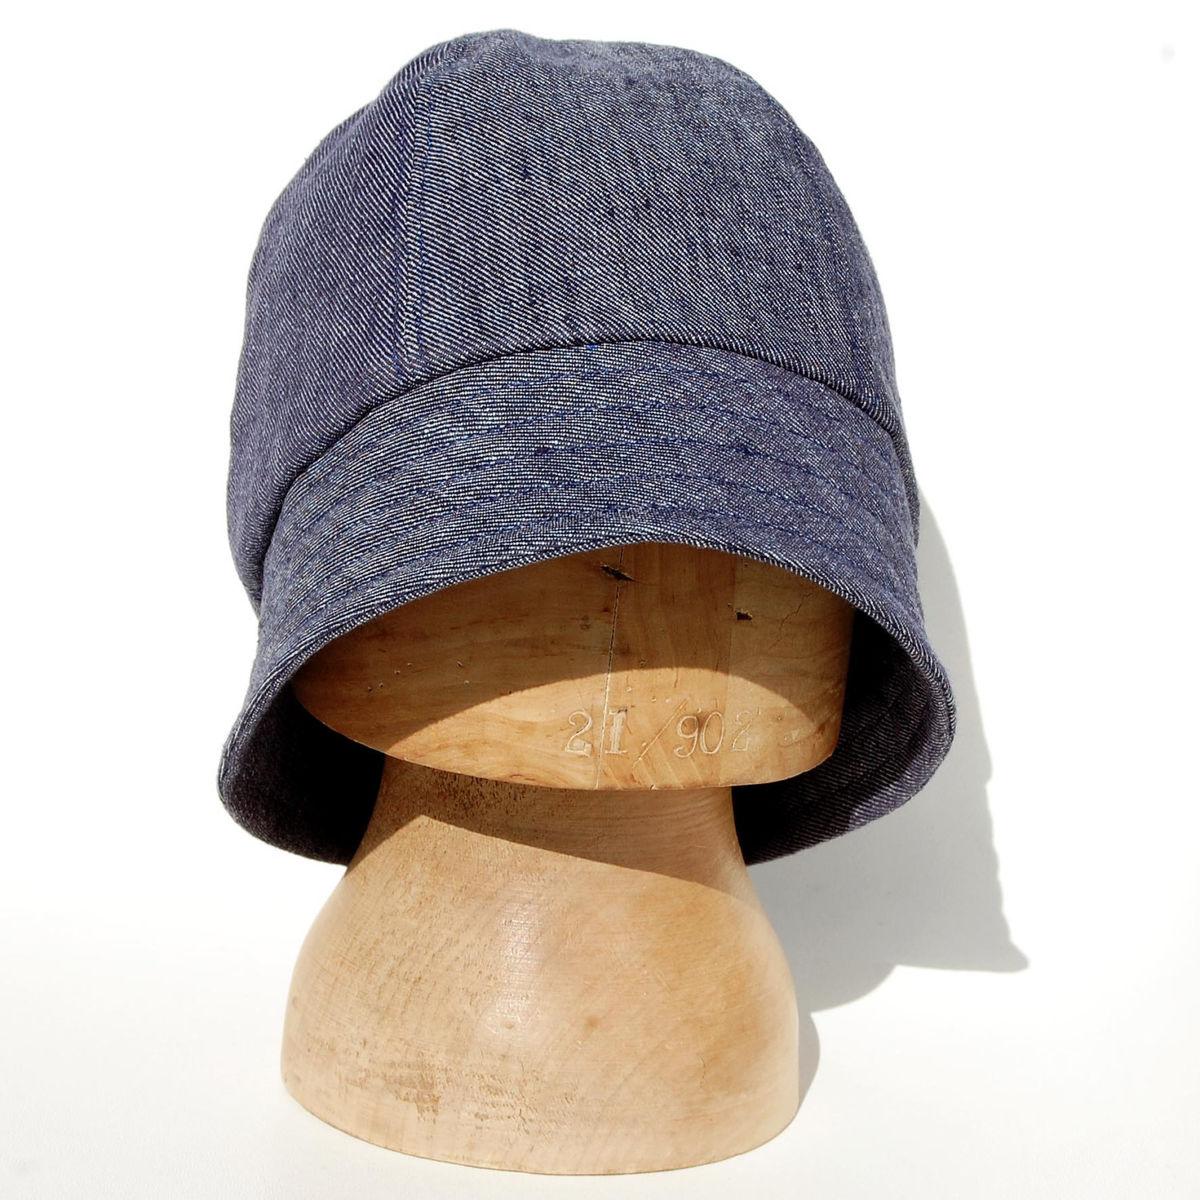 Indigo linen bucket hat ZUTjeanne - ZUT hats b636f9aad8f